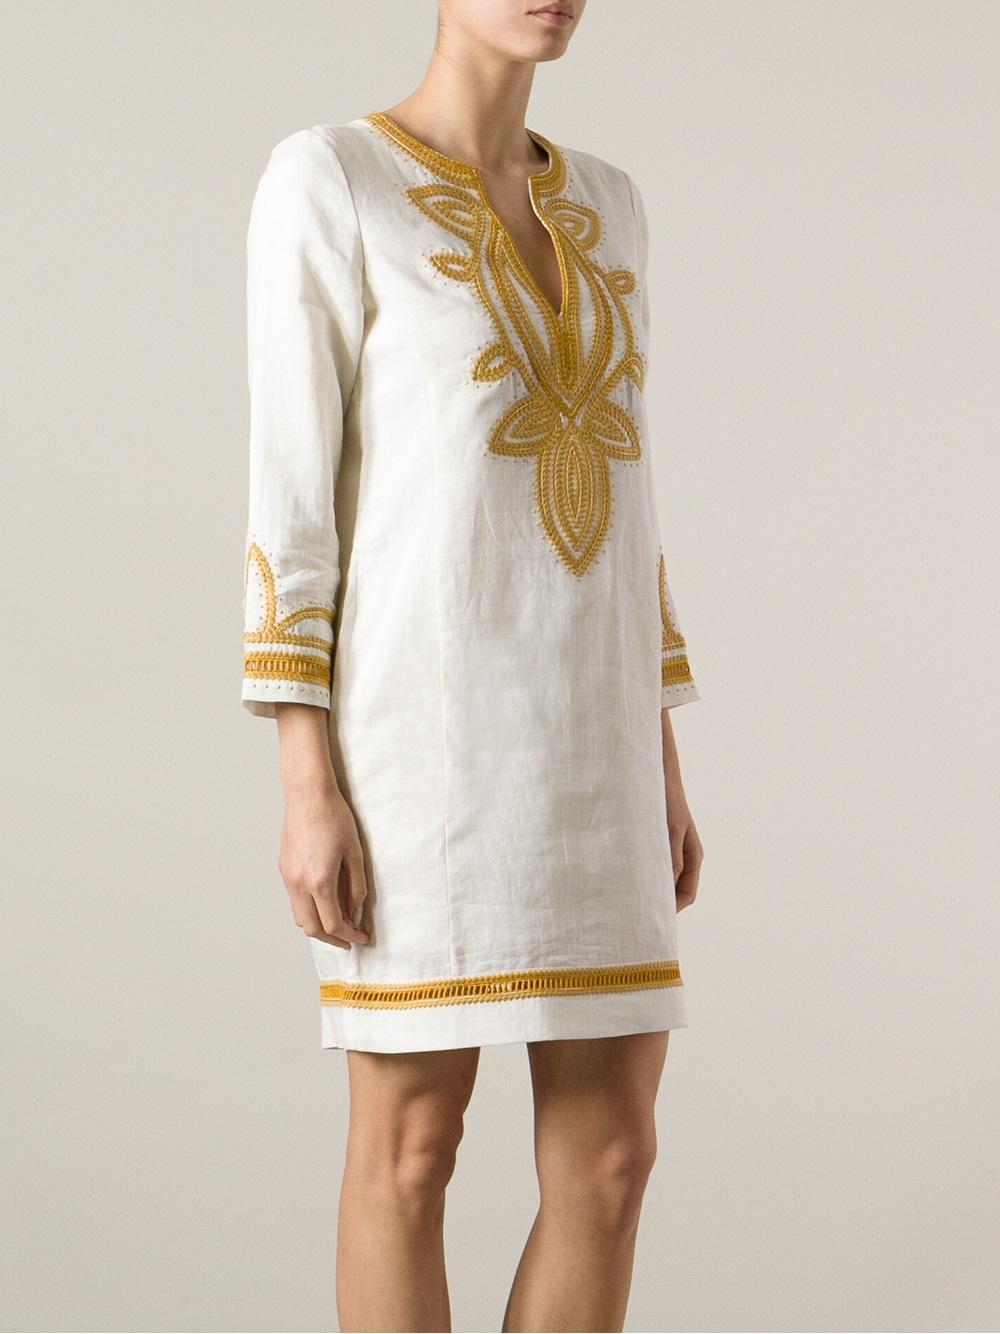 a1c0319cfa1d Lyst - Tory Burch Odelia Tunic Dress in White